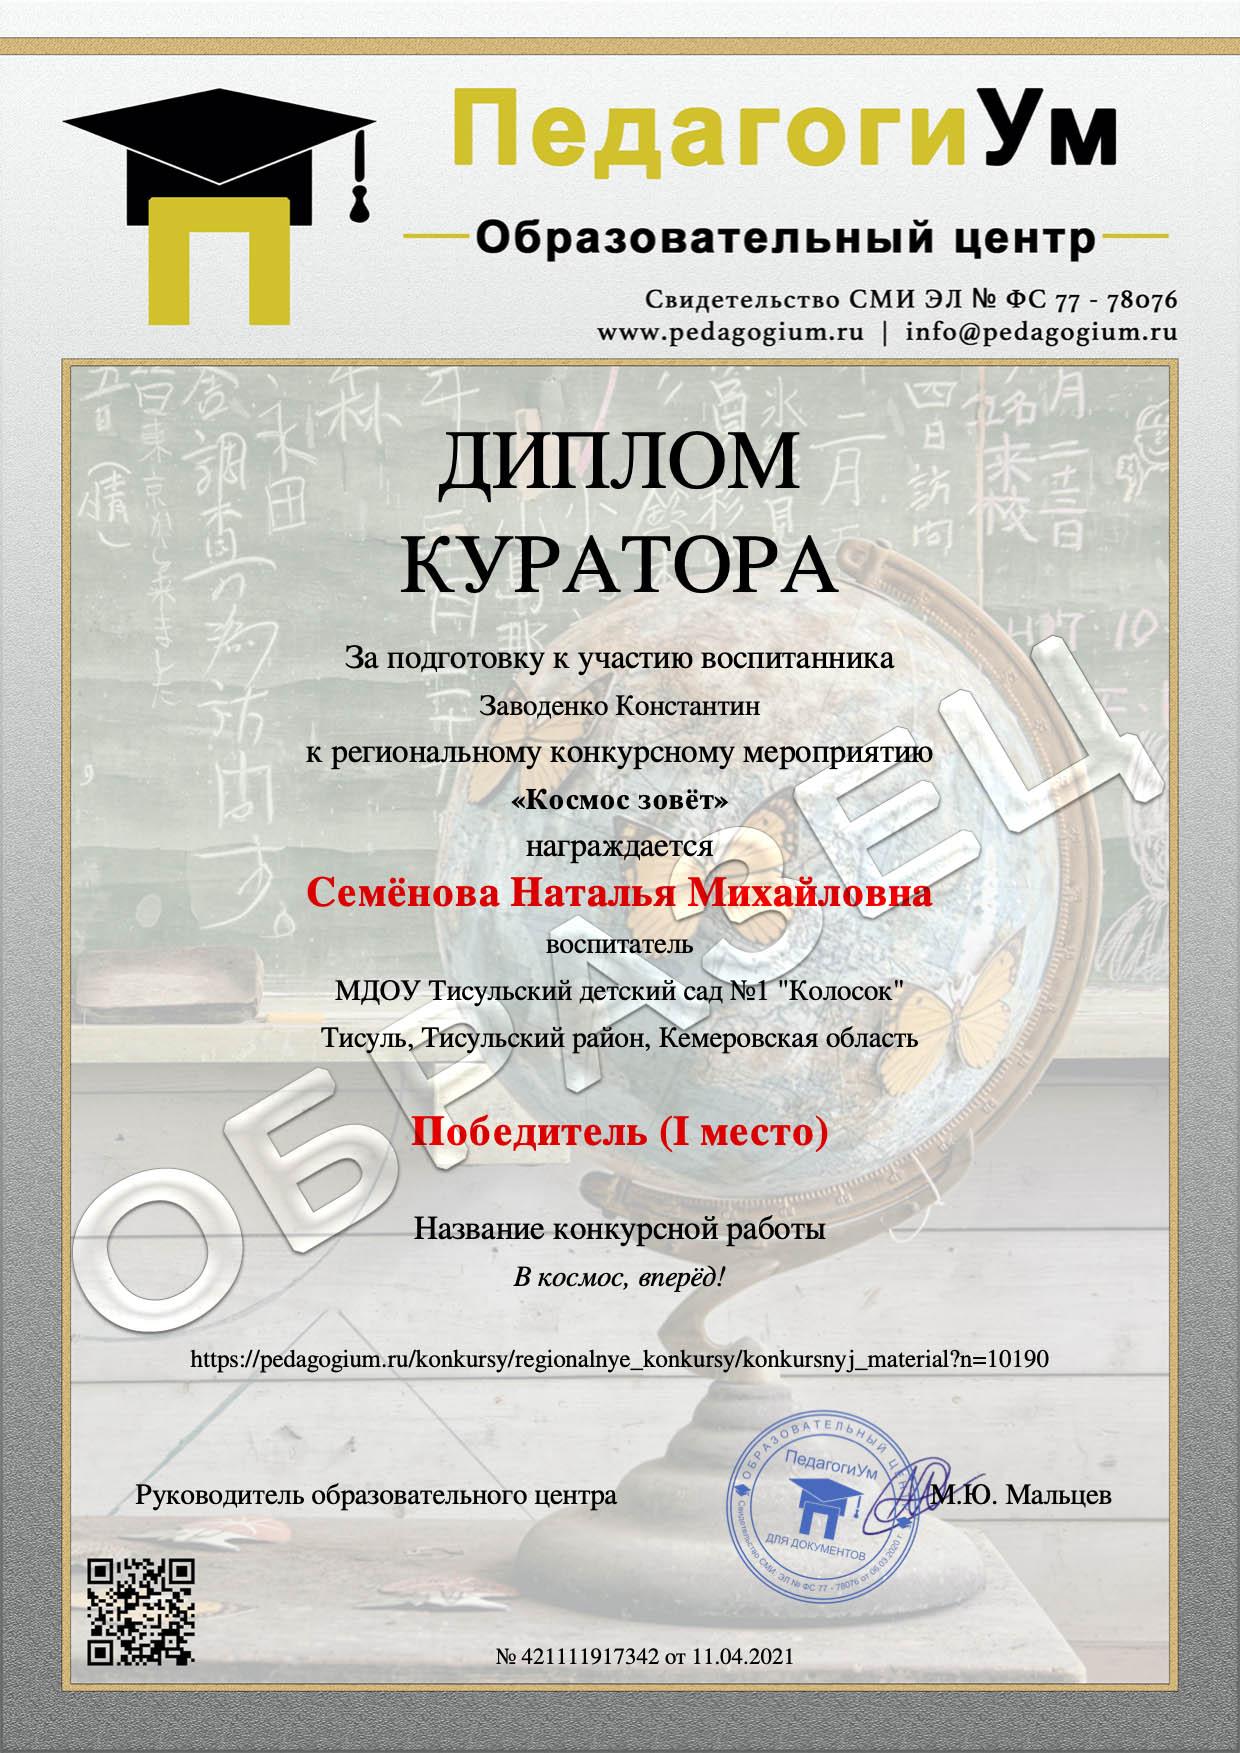 Образец документа педагогу-куратору регионального конкурса центра ПедагогиУм.